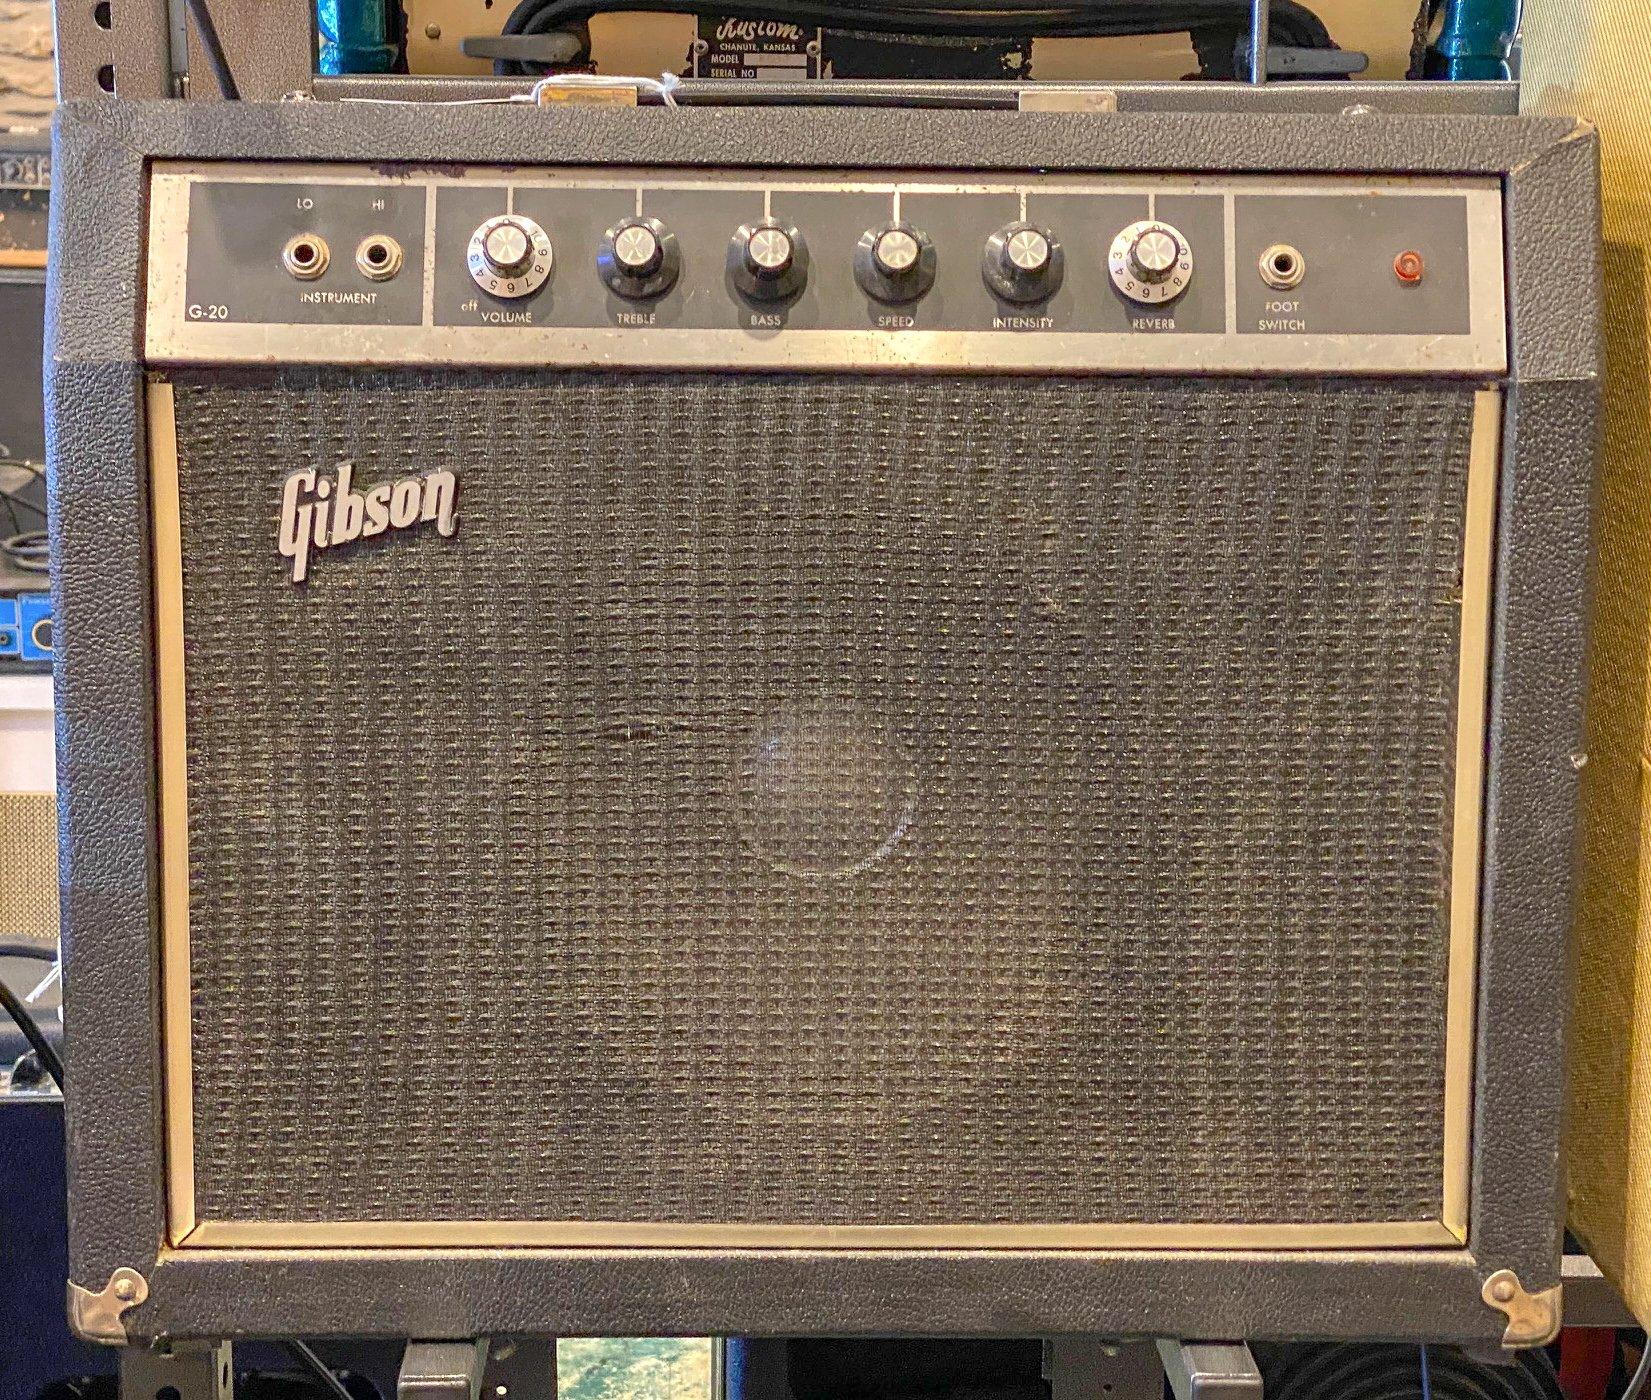 Gibson G-20